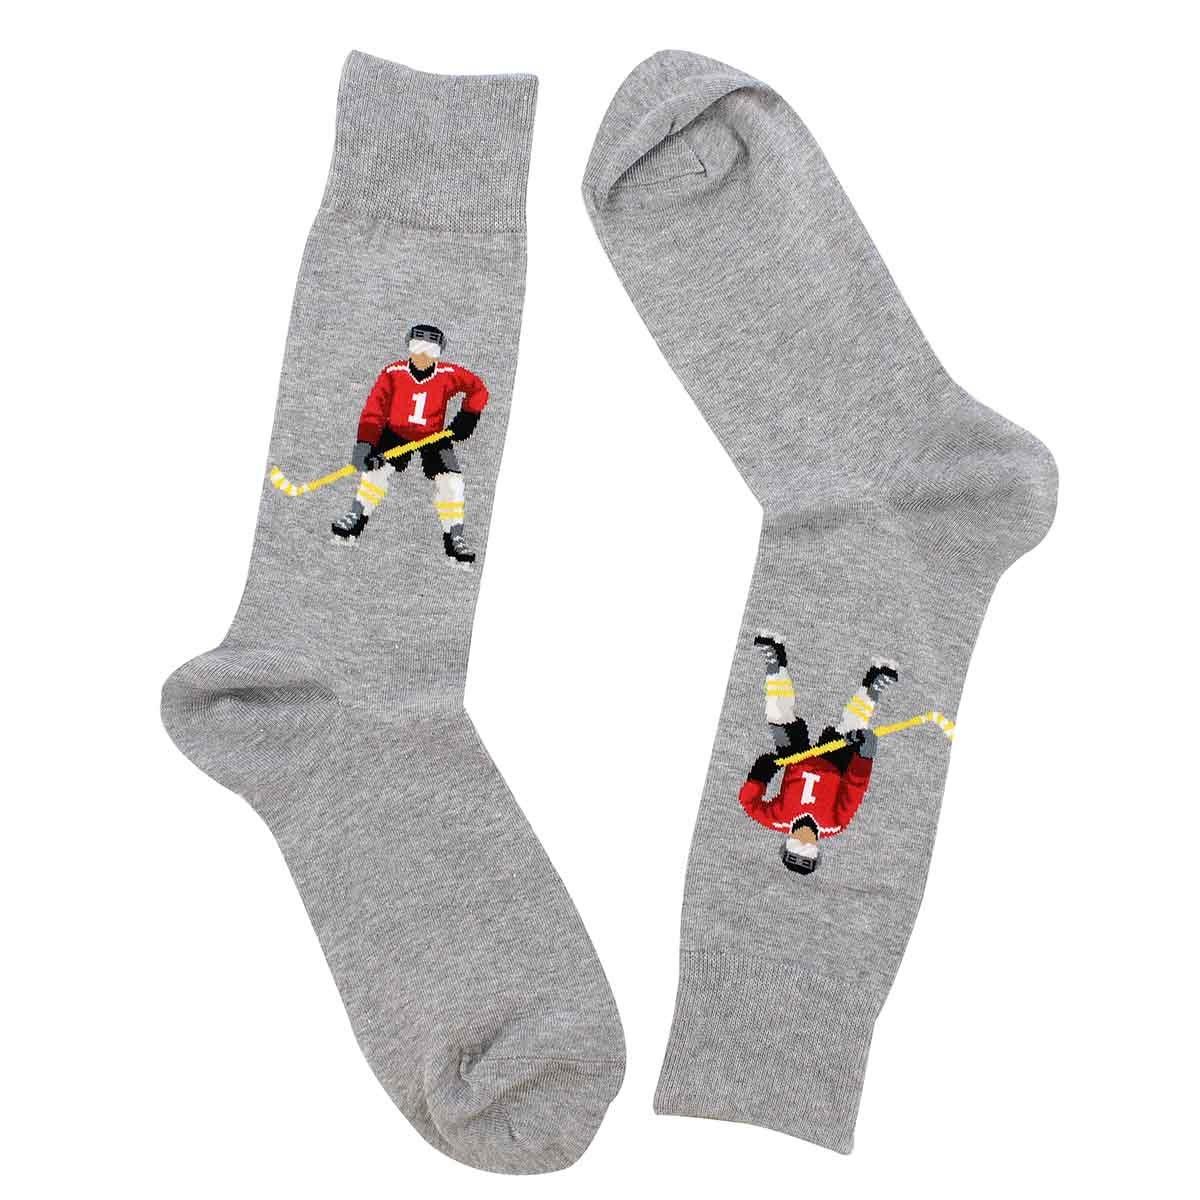 Mns Hockey Player grey printed sock